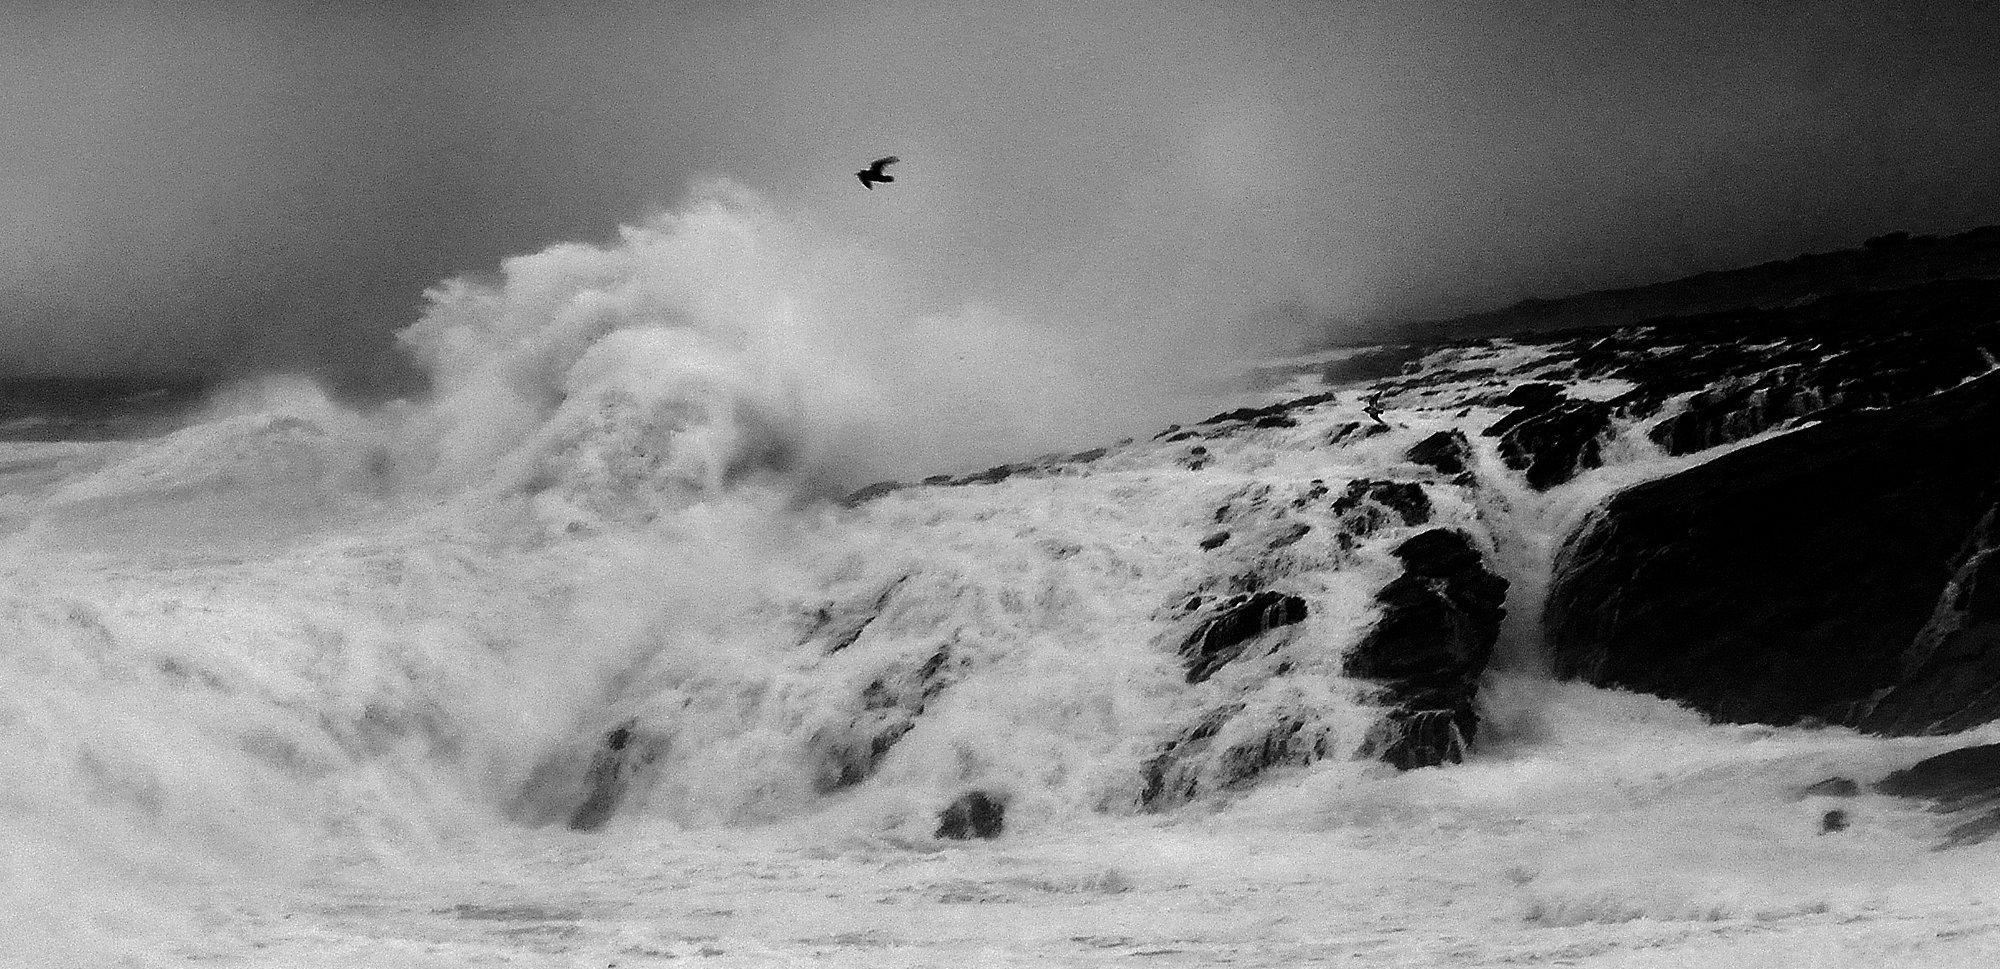 Tempête sur la côte sauvage de Quiberon, Morbihan